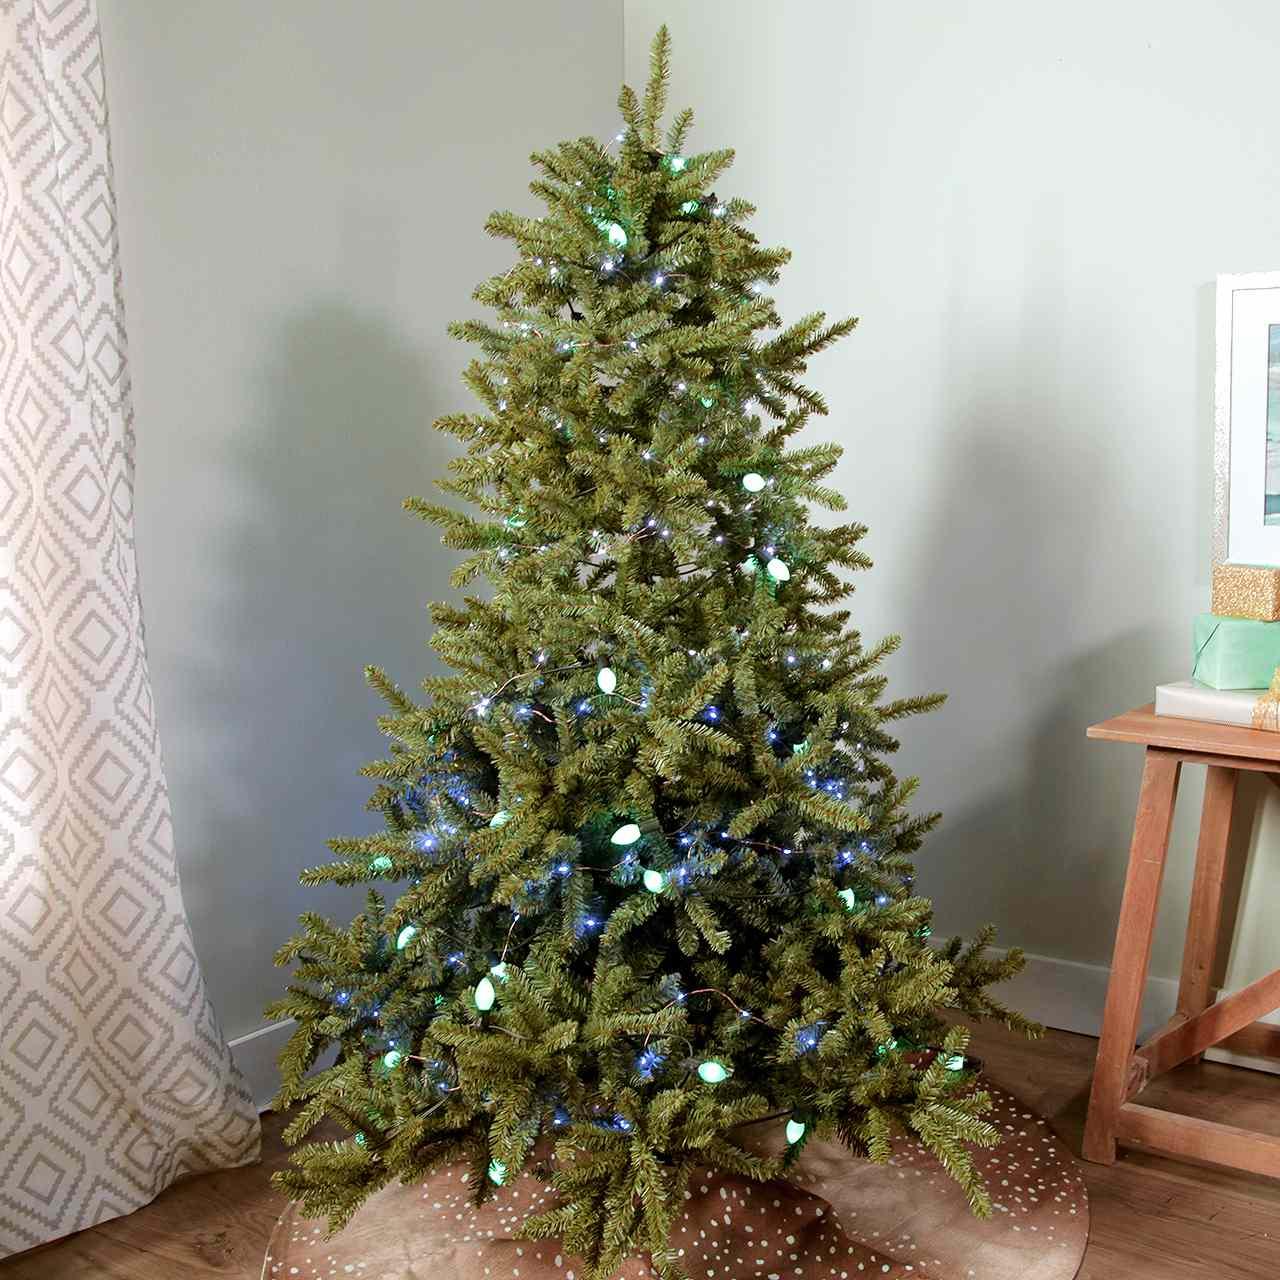 hight resolution of hanging christmas lights on tree video still